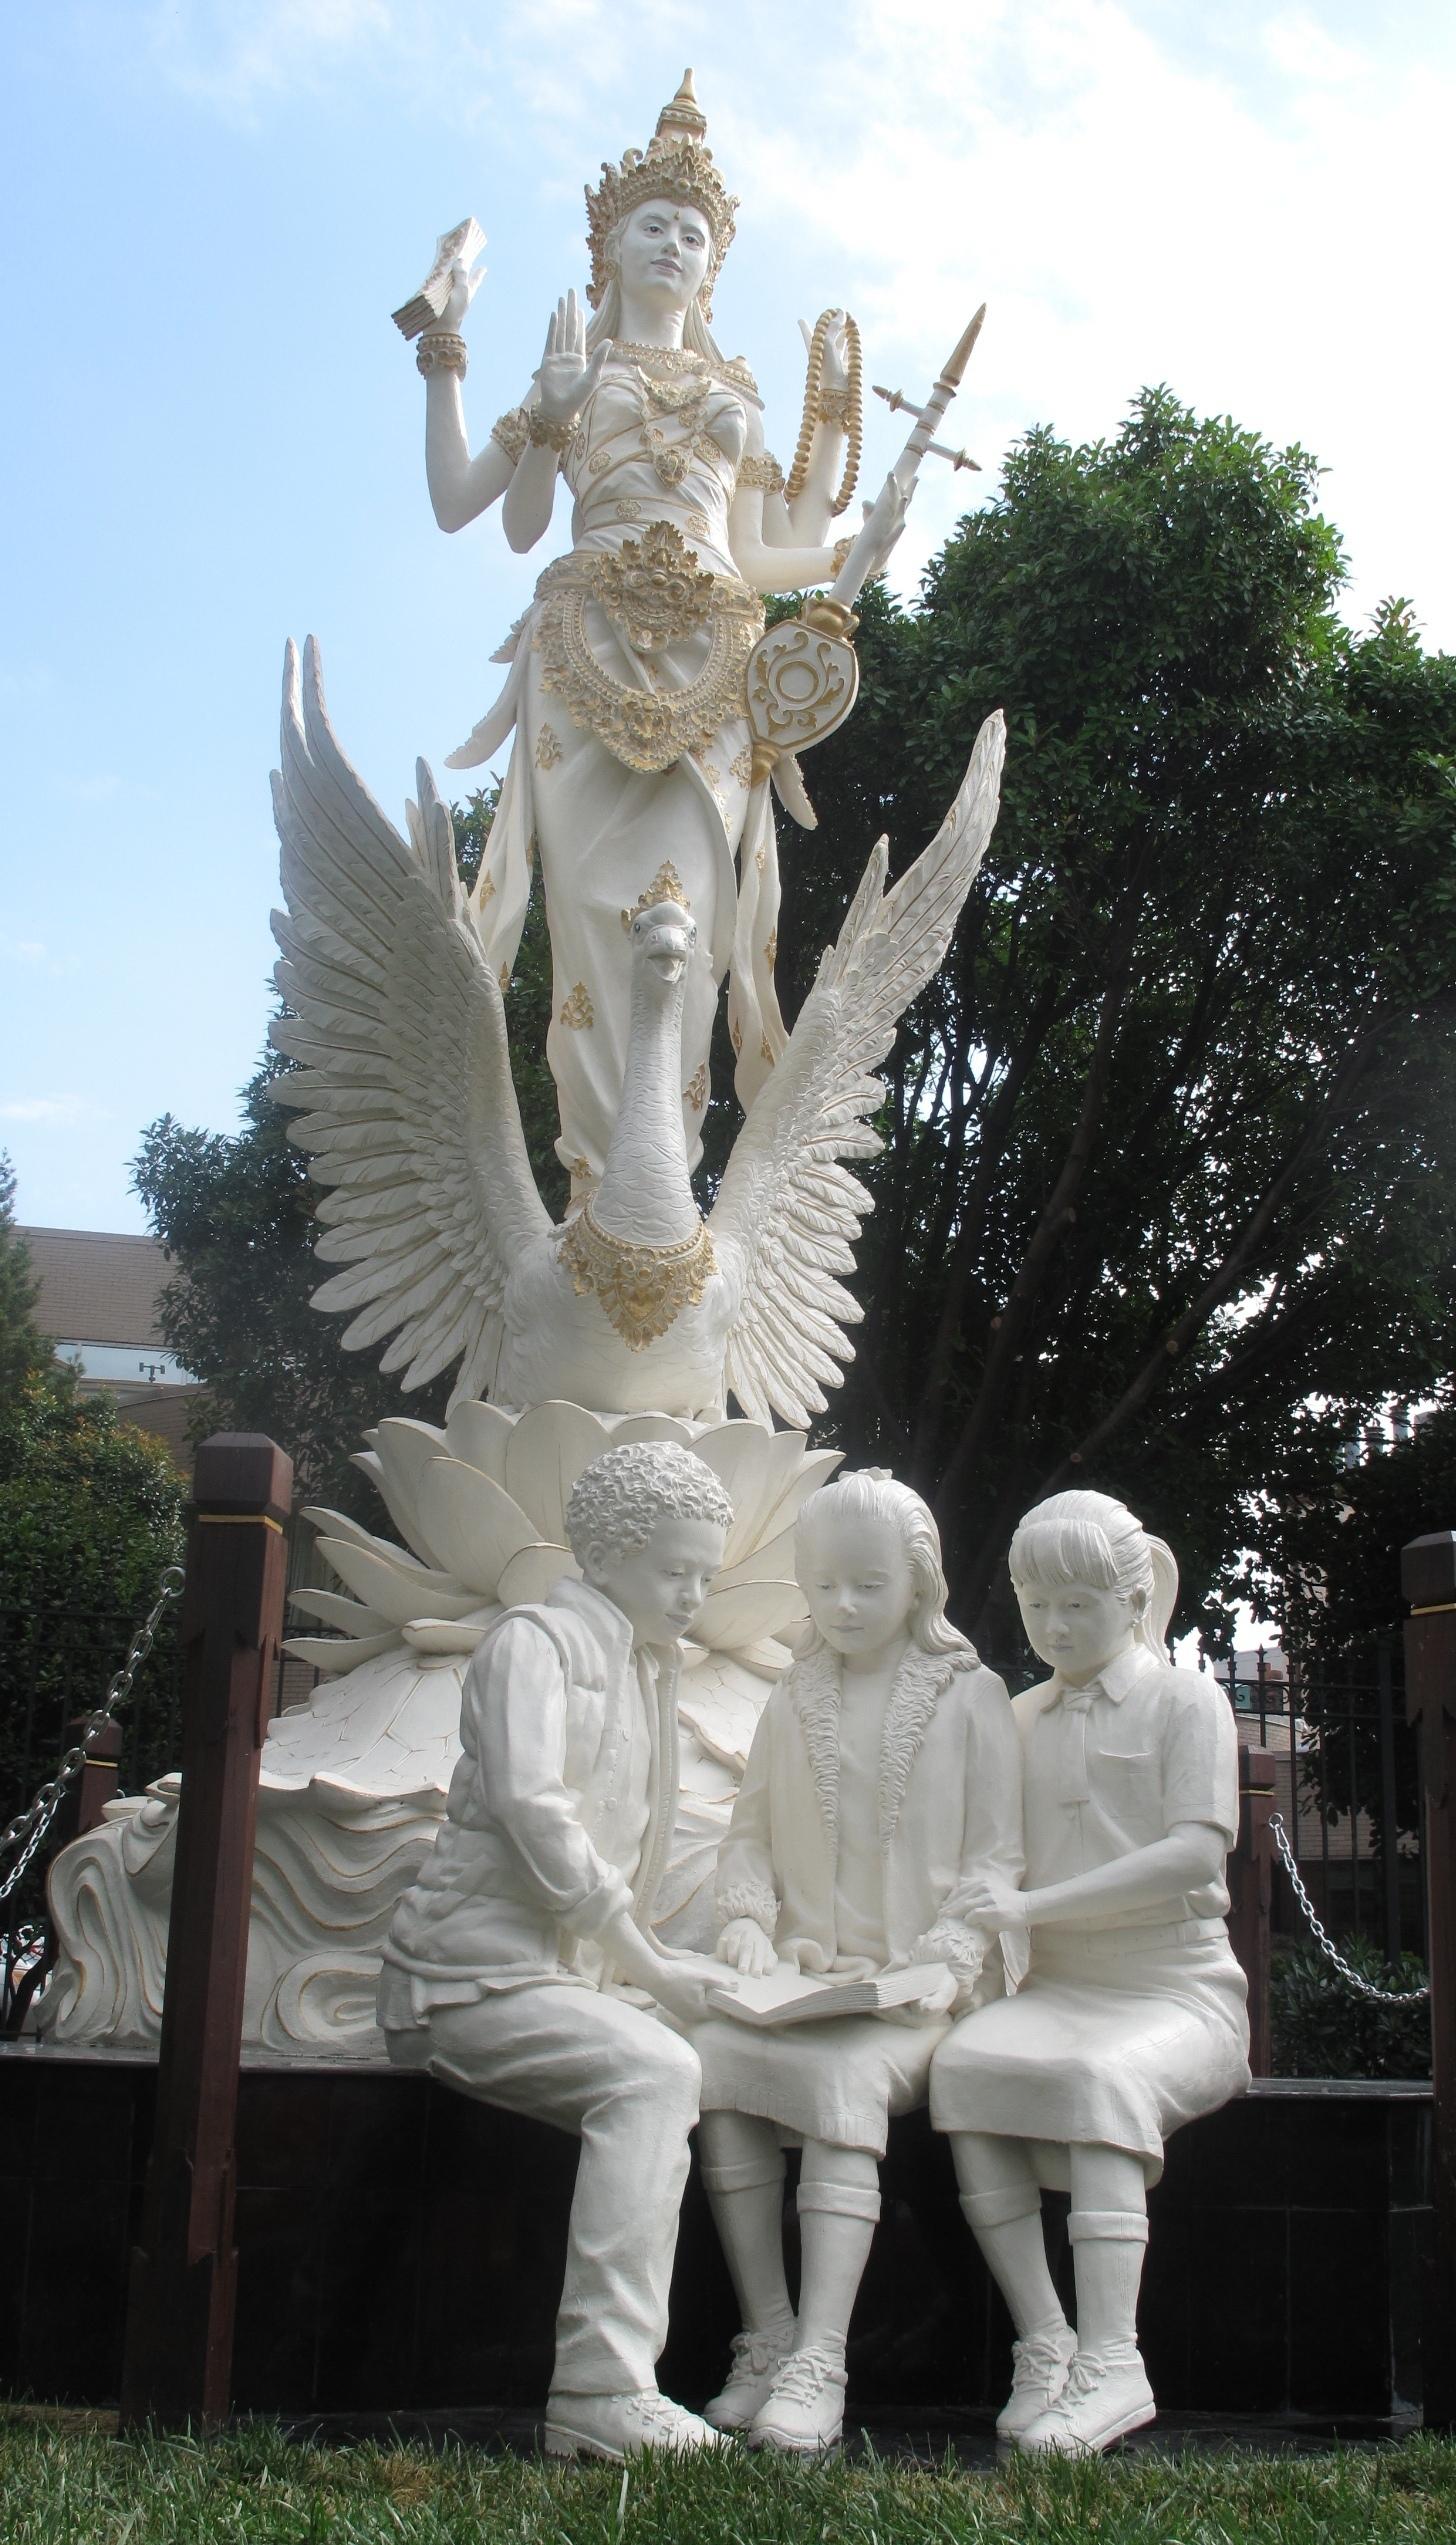 A Hindu Goddess Arrives To Bless Embassy Row